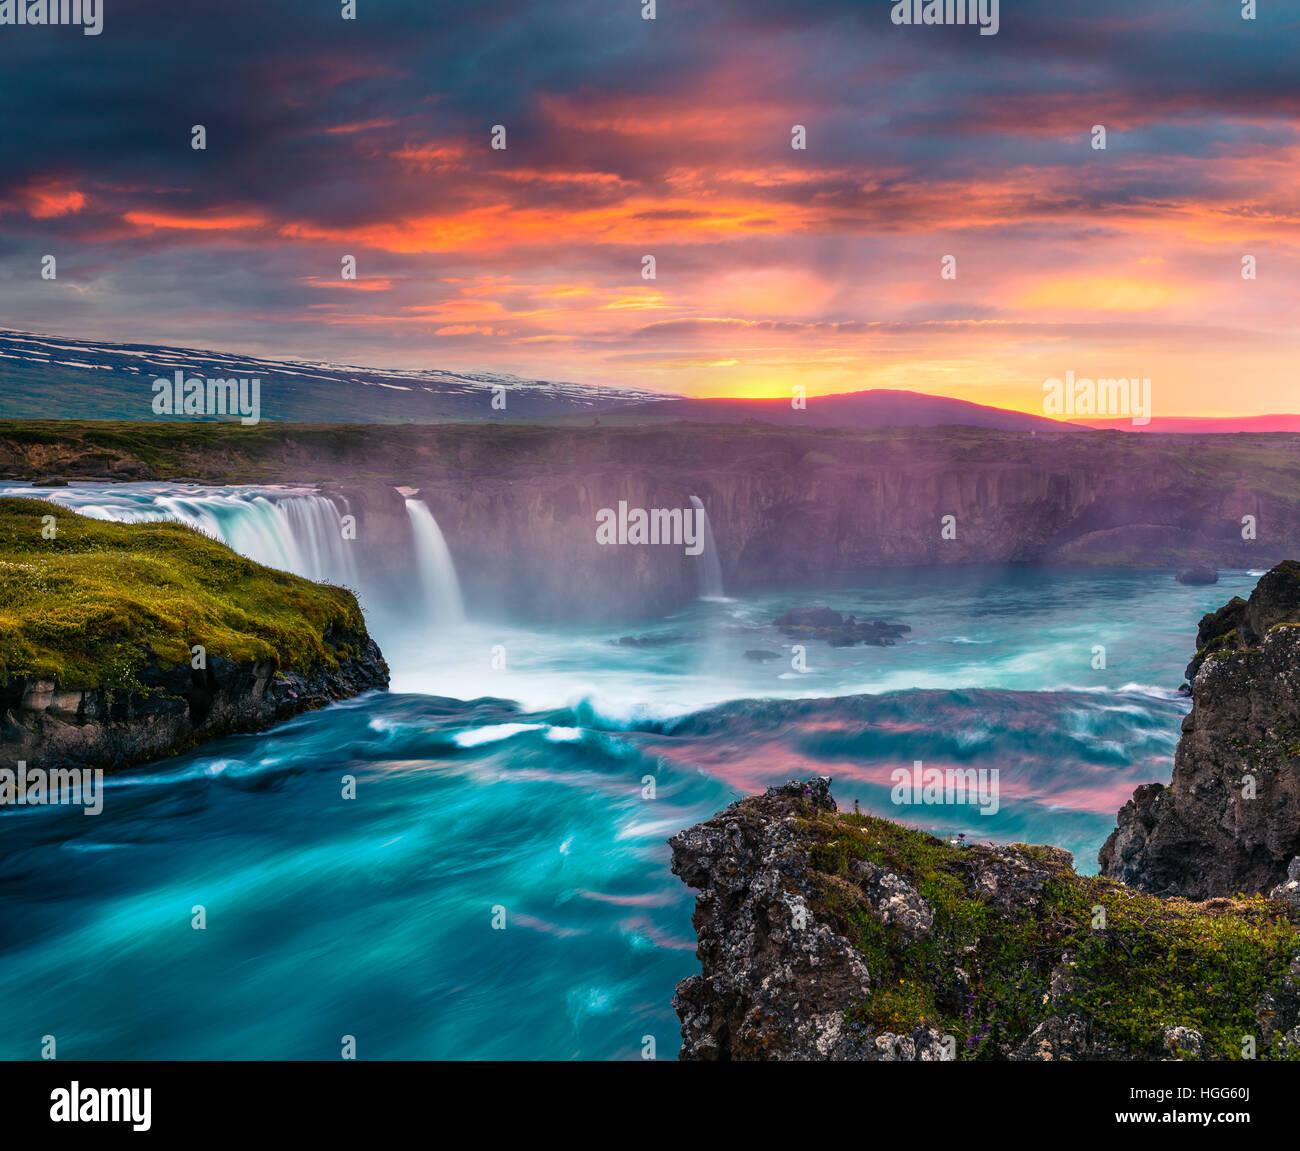 Sommer-morgen-Szene auf den Godafoss-Wasserfall. Farbenprächtigen Sonnenuntergang am Skjalfandafljot Fluss, Stockbild